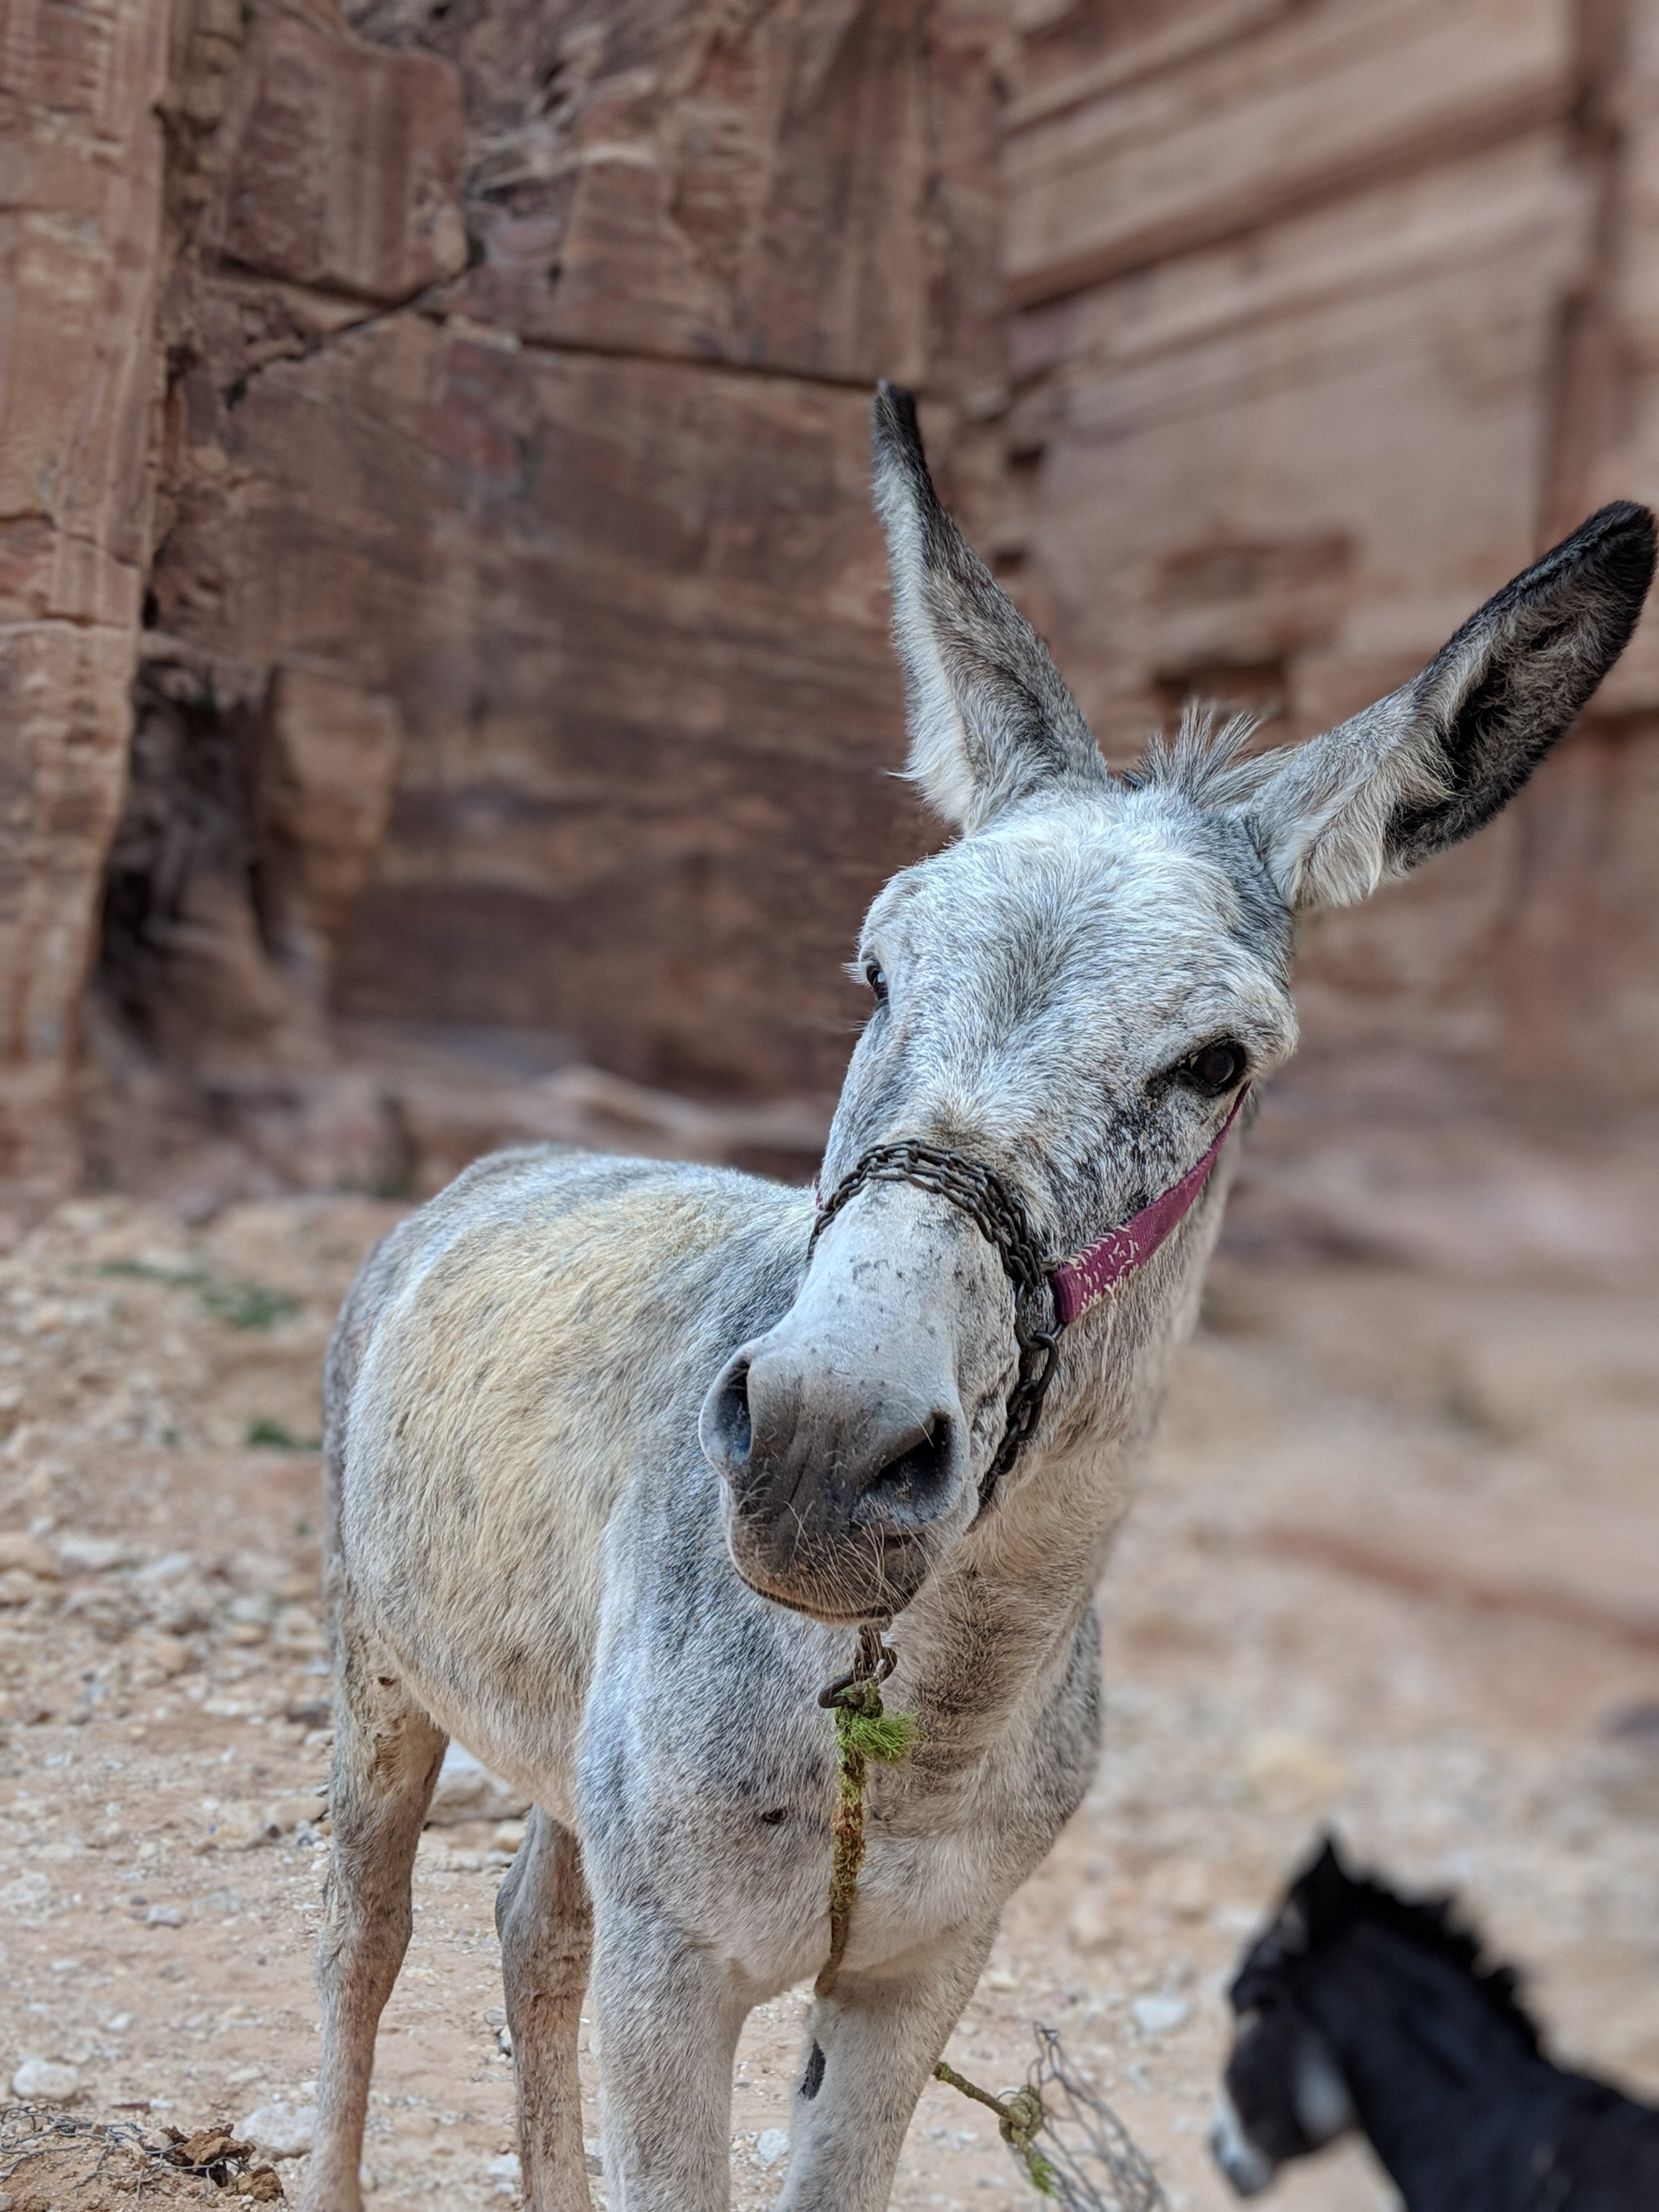 You will encounter many (friendly!) donkeys.